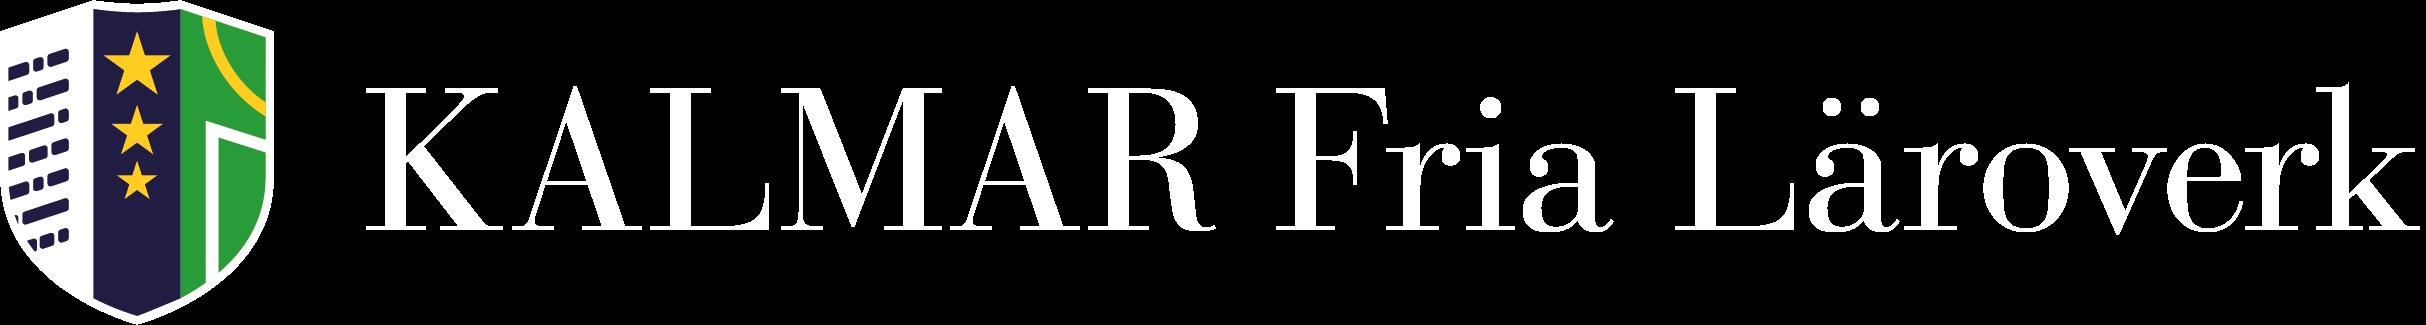 Kalmar Fria läroverk